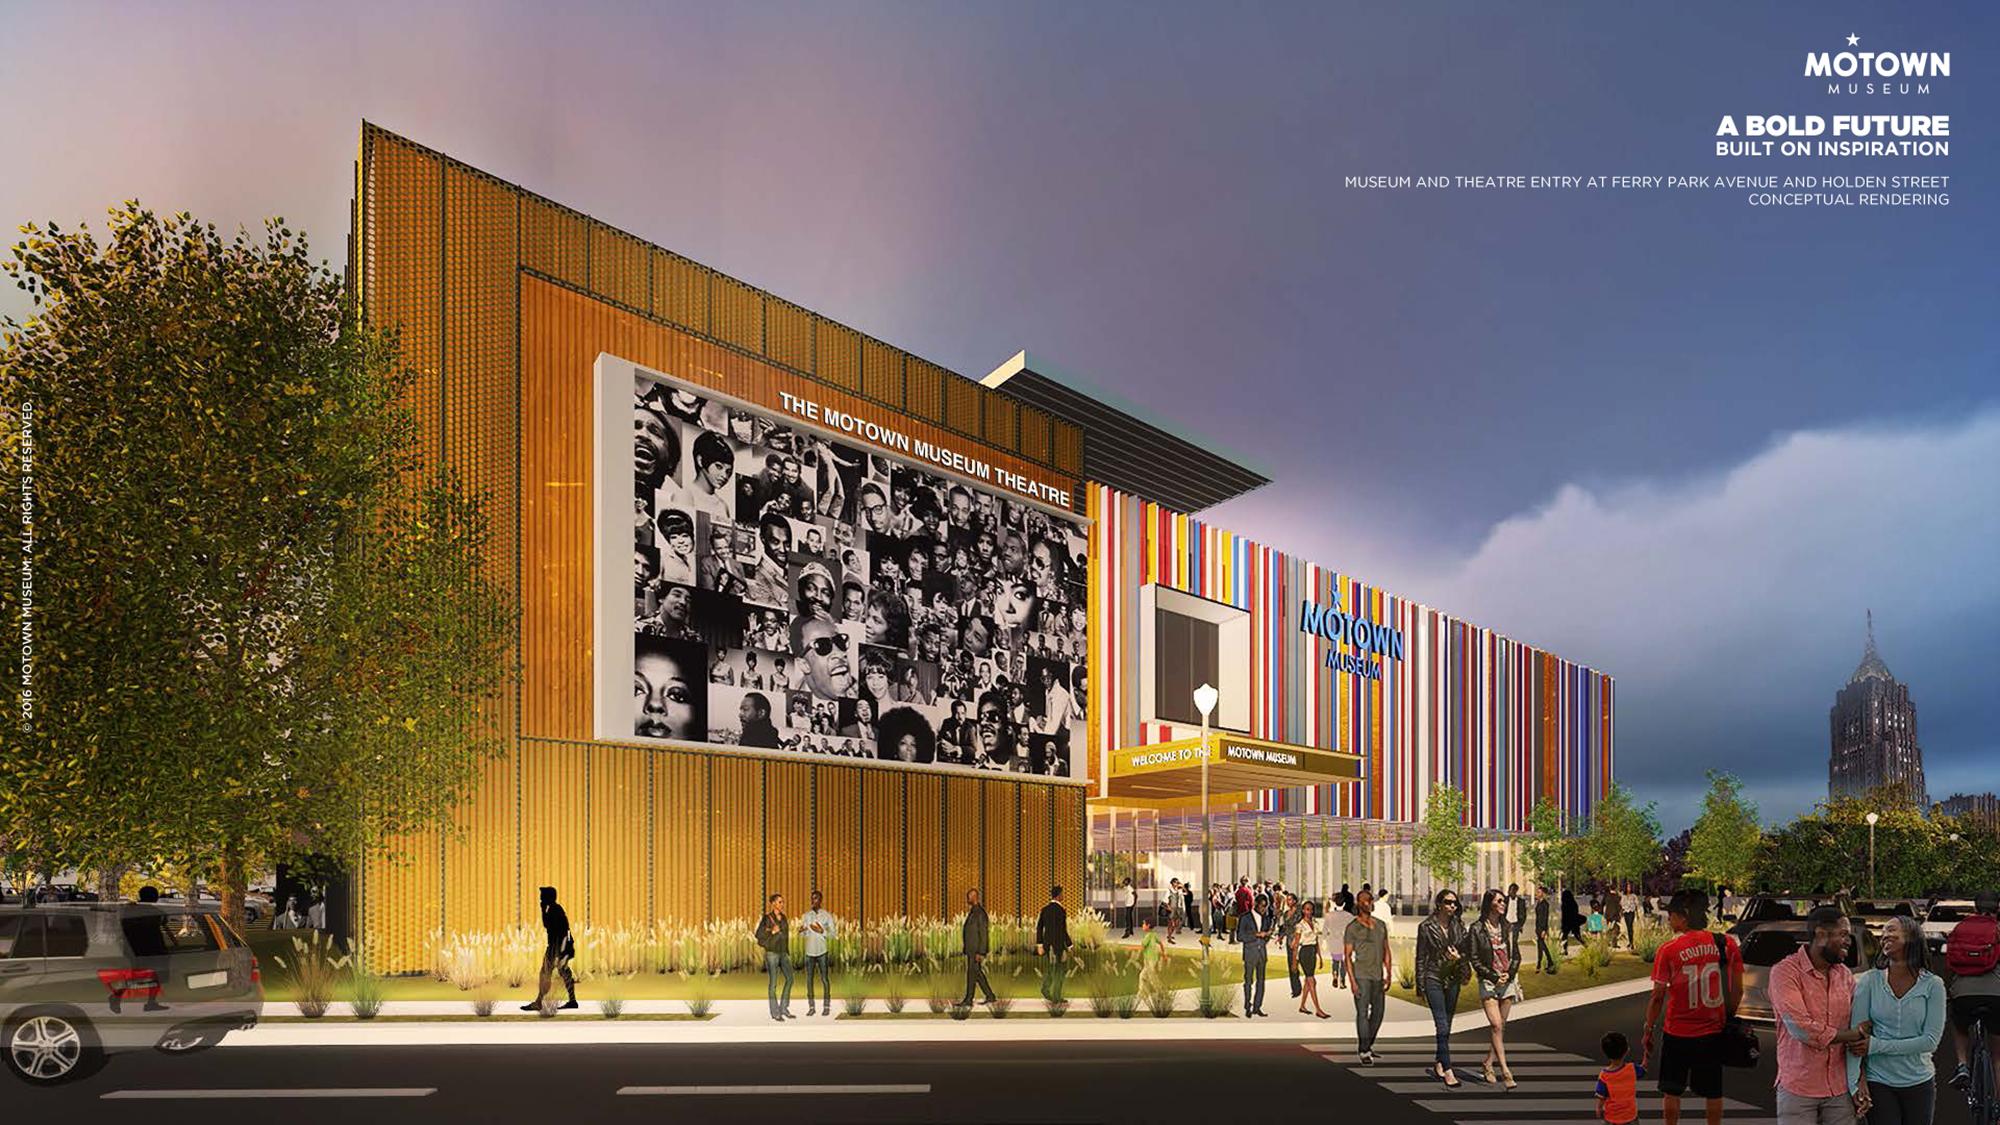 Image: Motown Museum